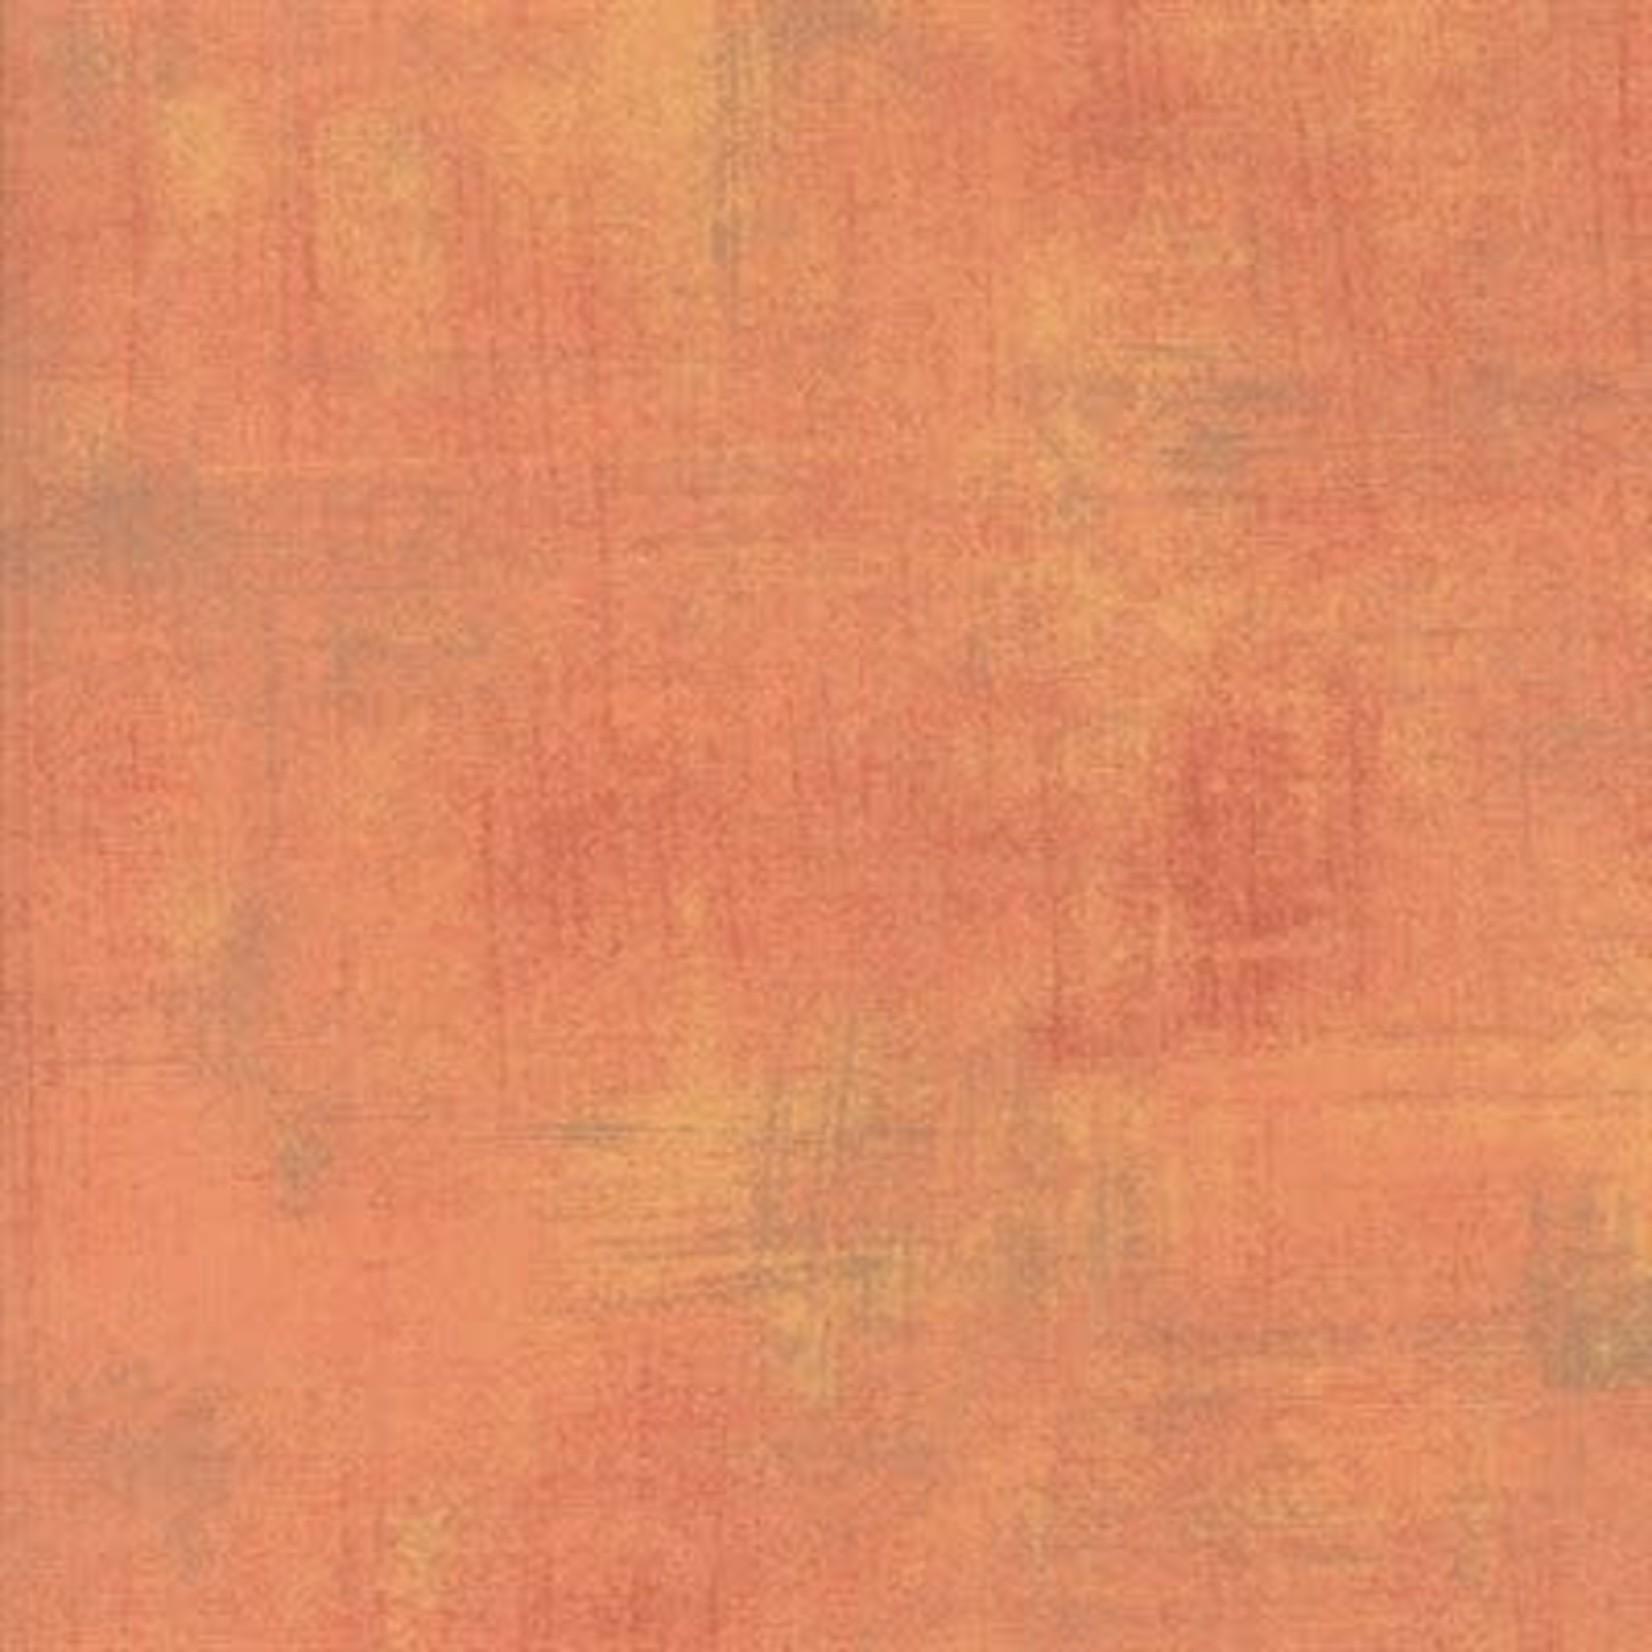 Moda Grunge Basics Grunge - Cantalope per cm or $20/m